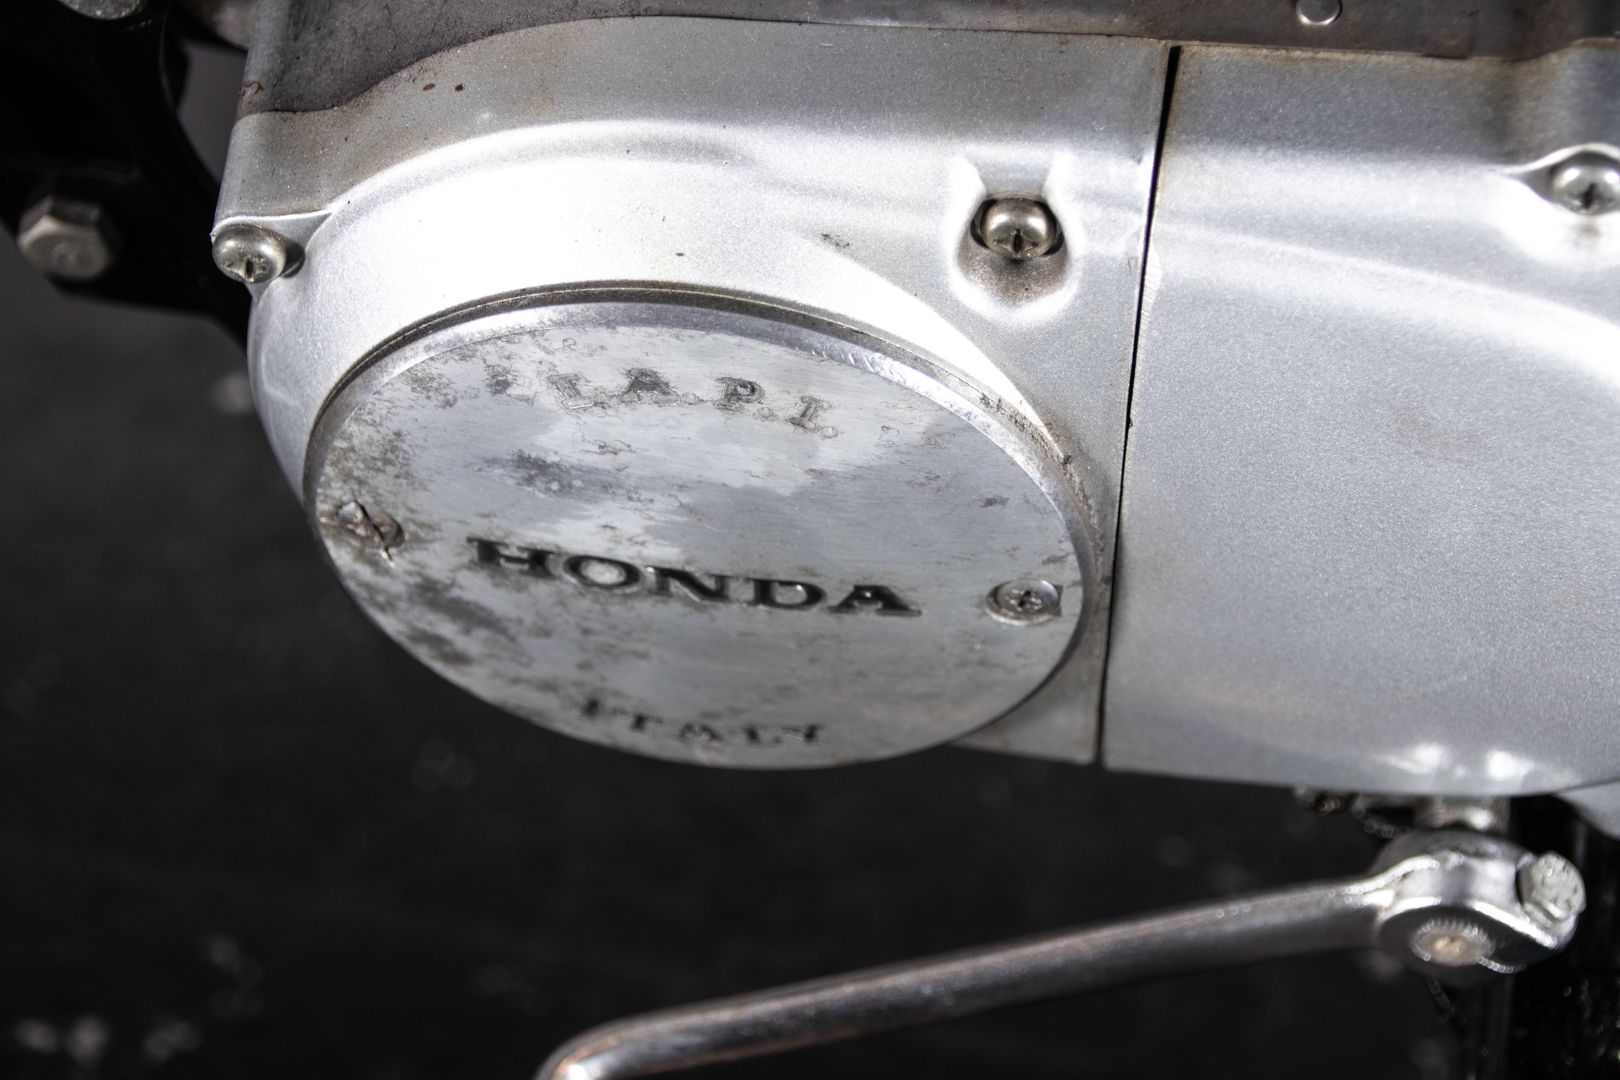 1980 Honda CB 125 7/C 63469